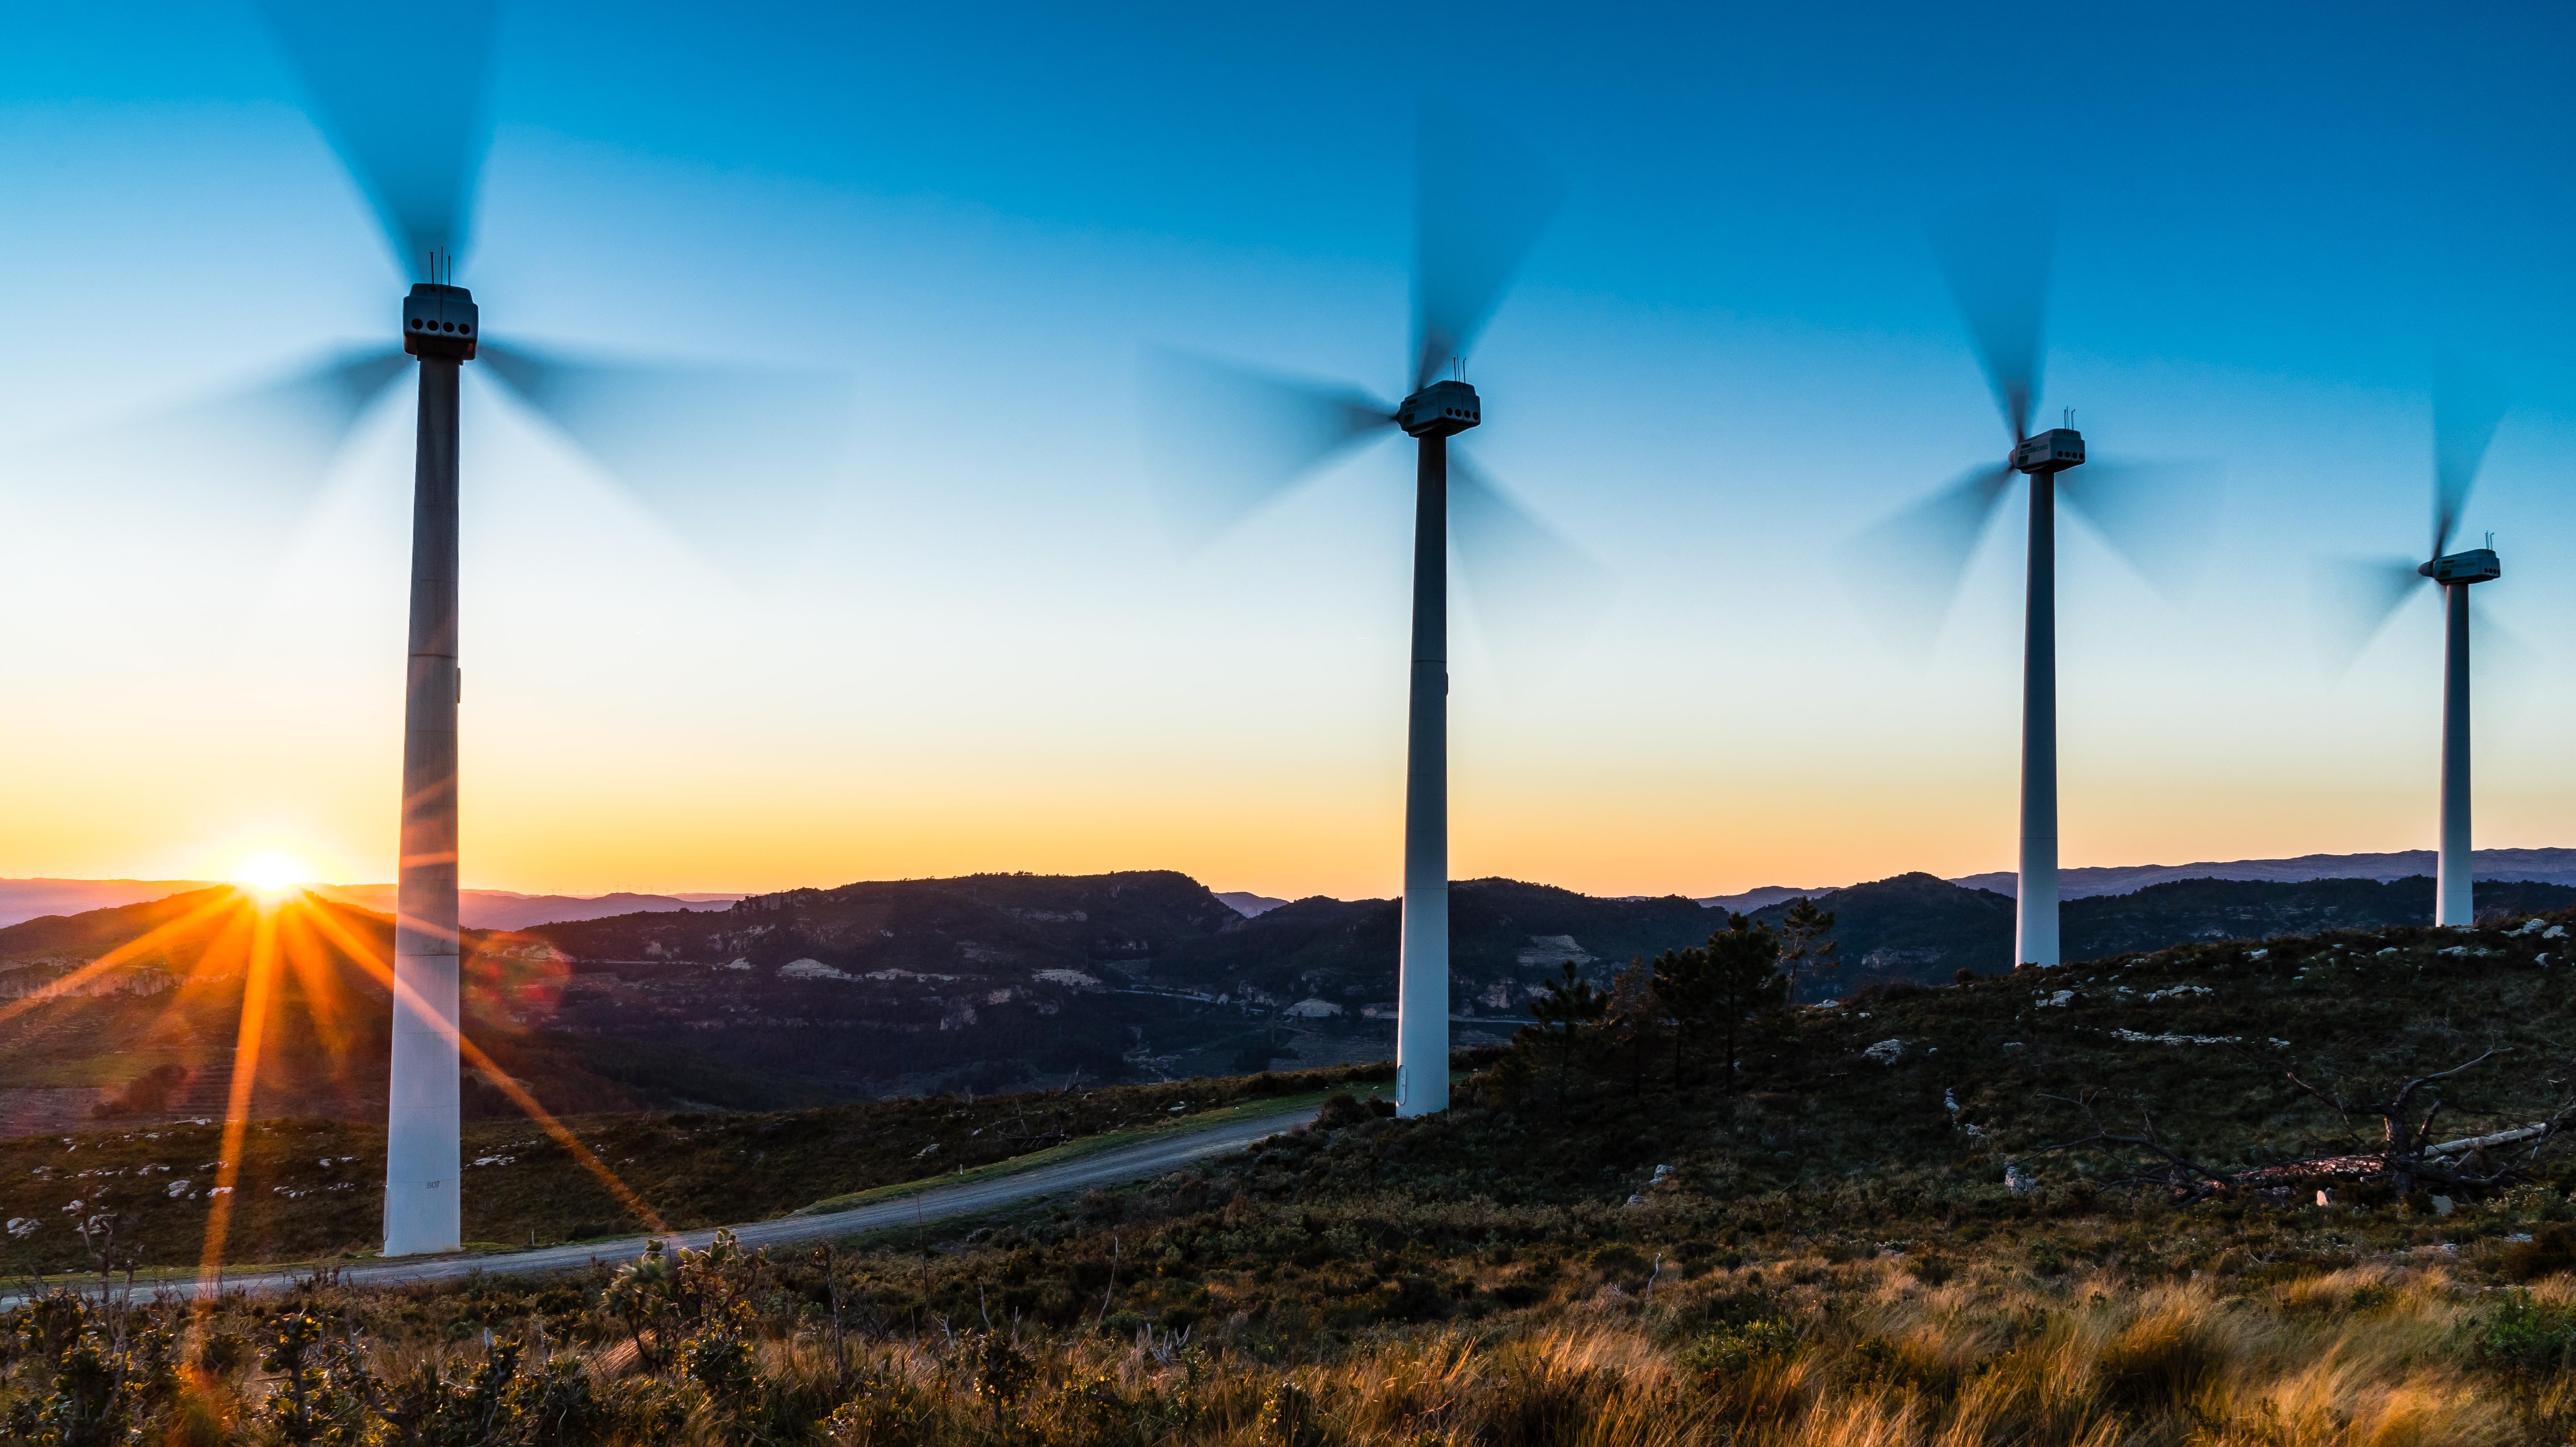 Wind_Turbine_Tarragona_Spain_5765x3843_ by _perSona_Flickr